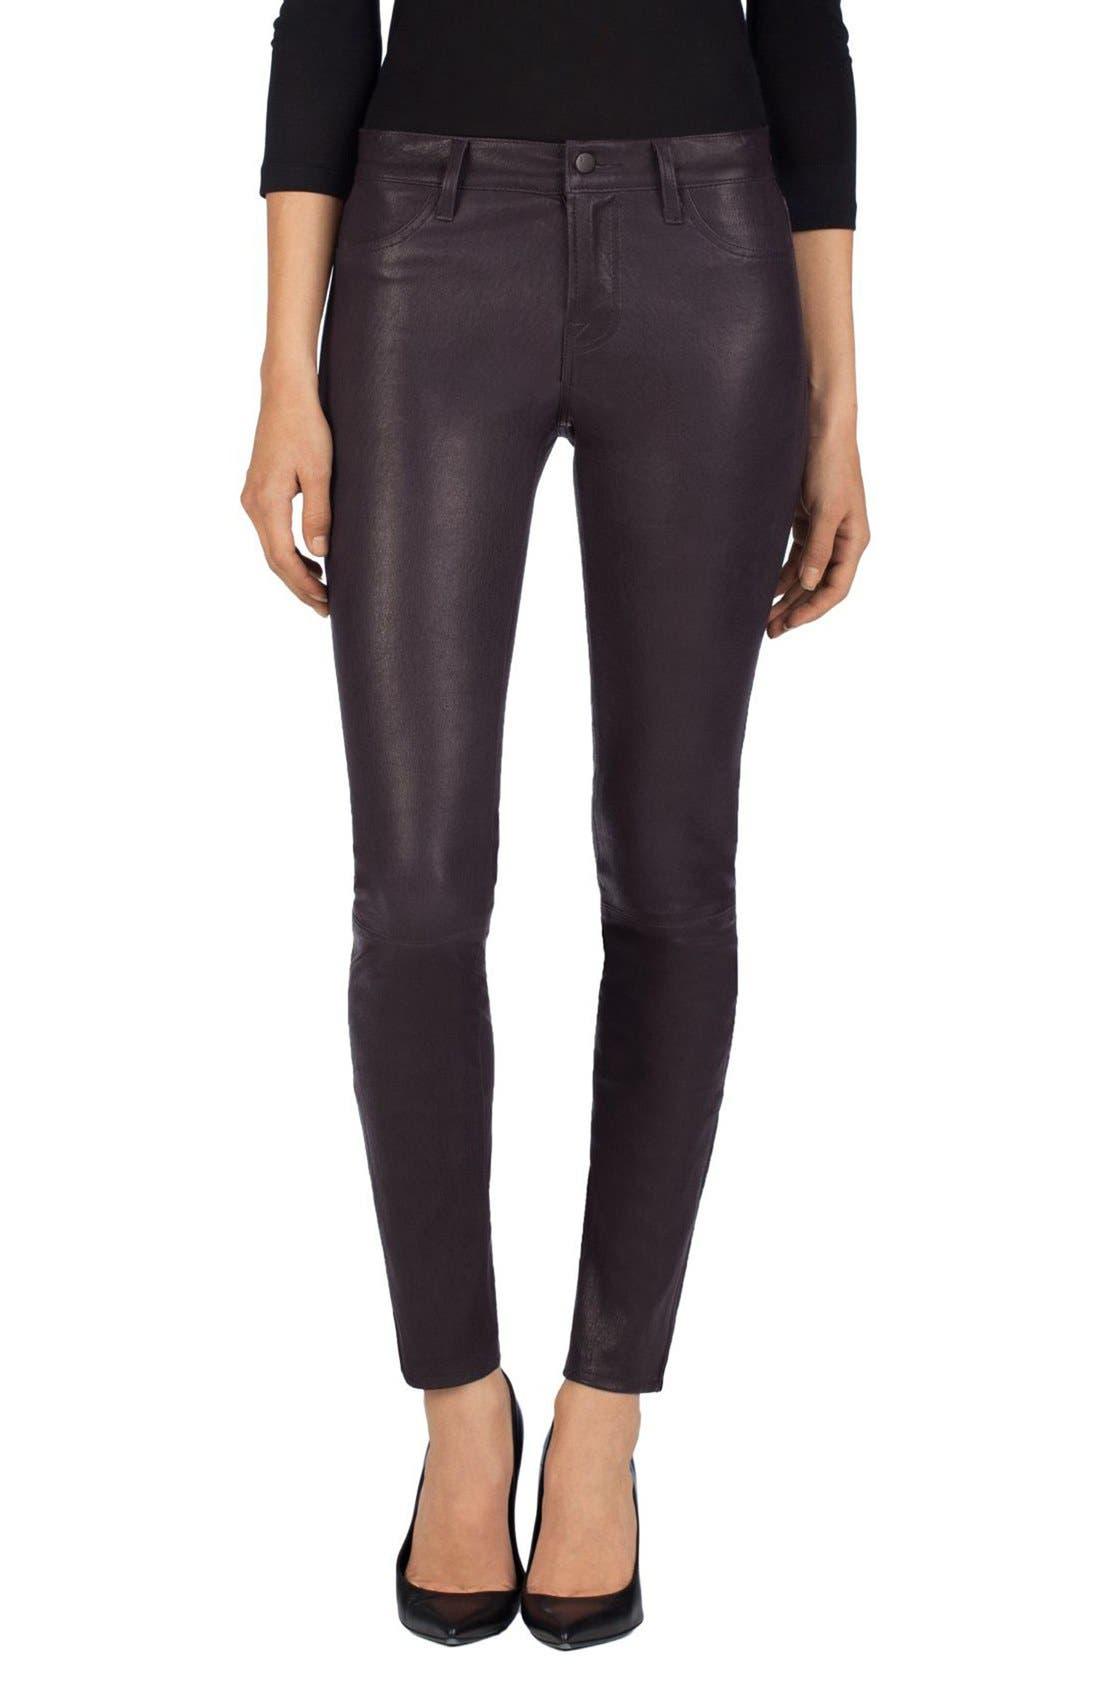 Alternate Image 1 Selected - J Brand '8001' Lambskin Leather Pants